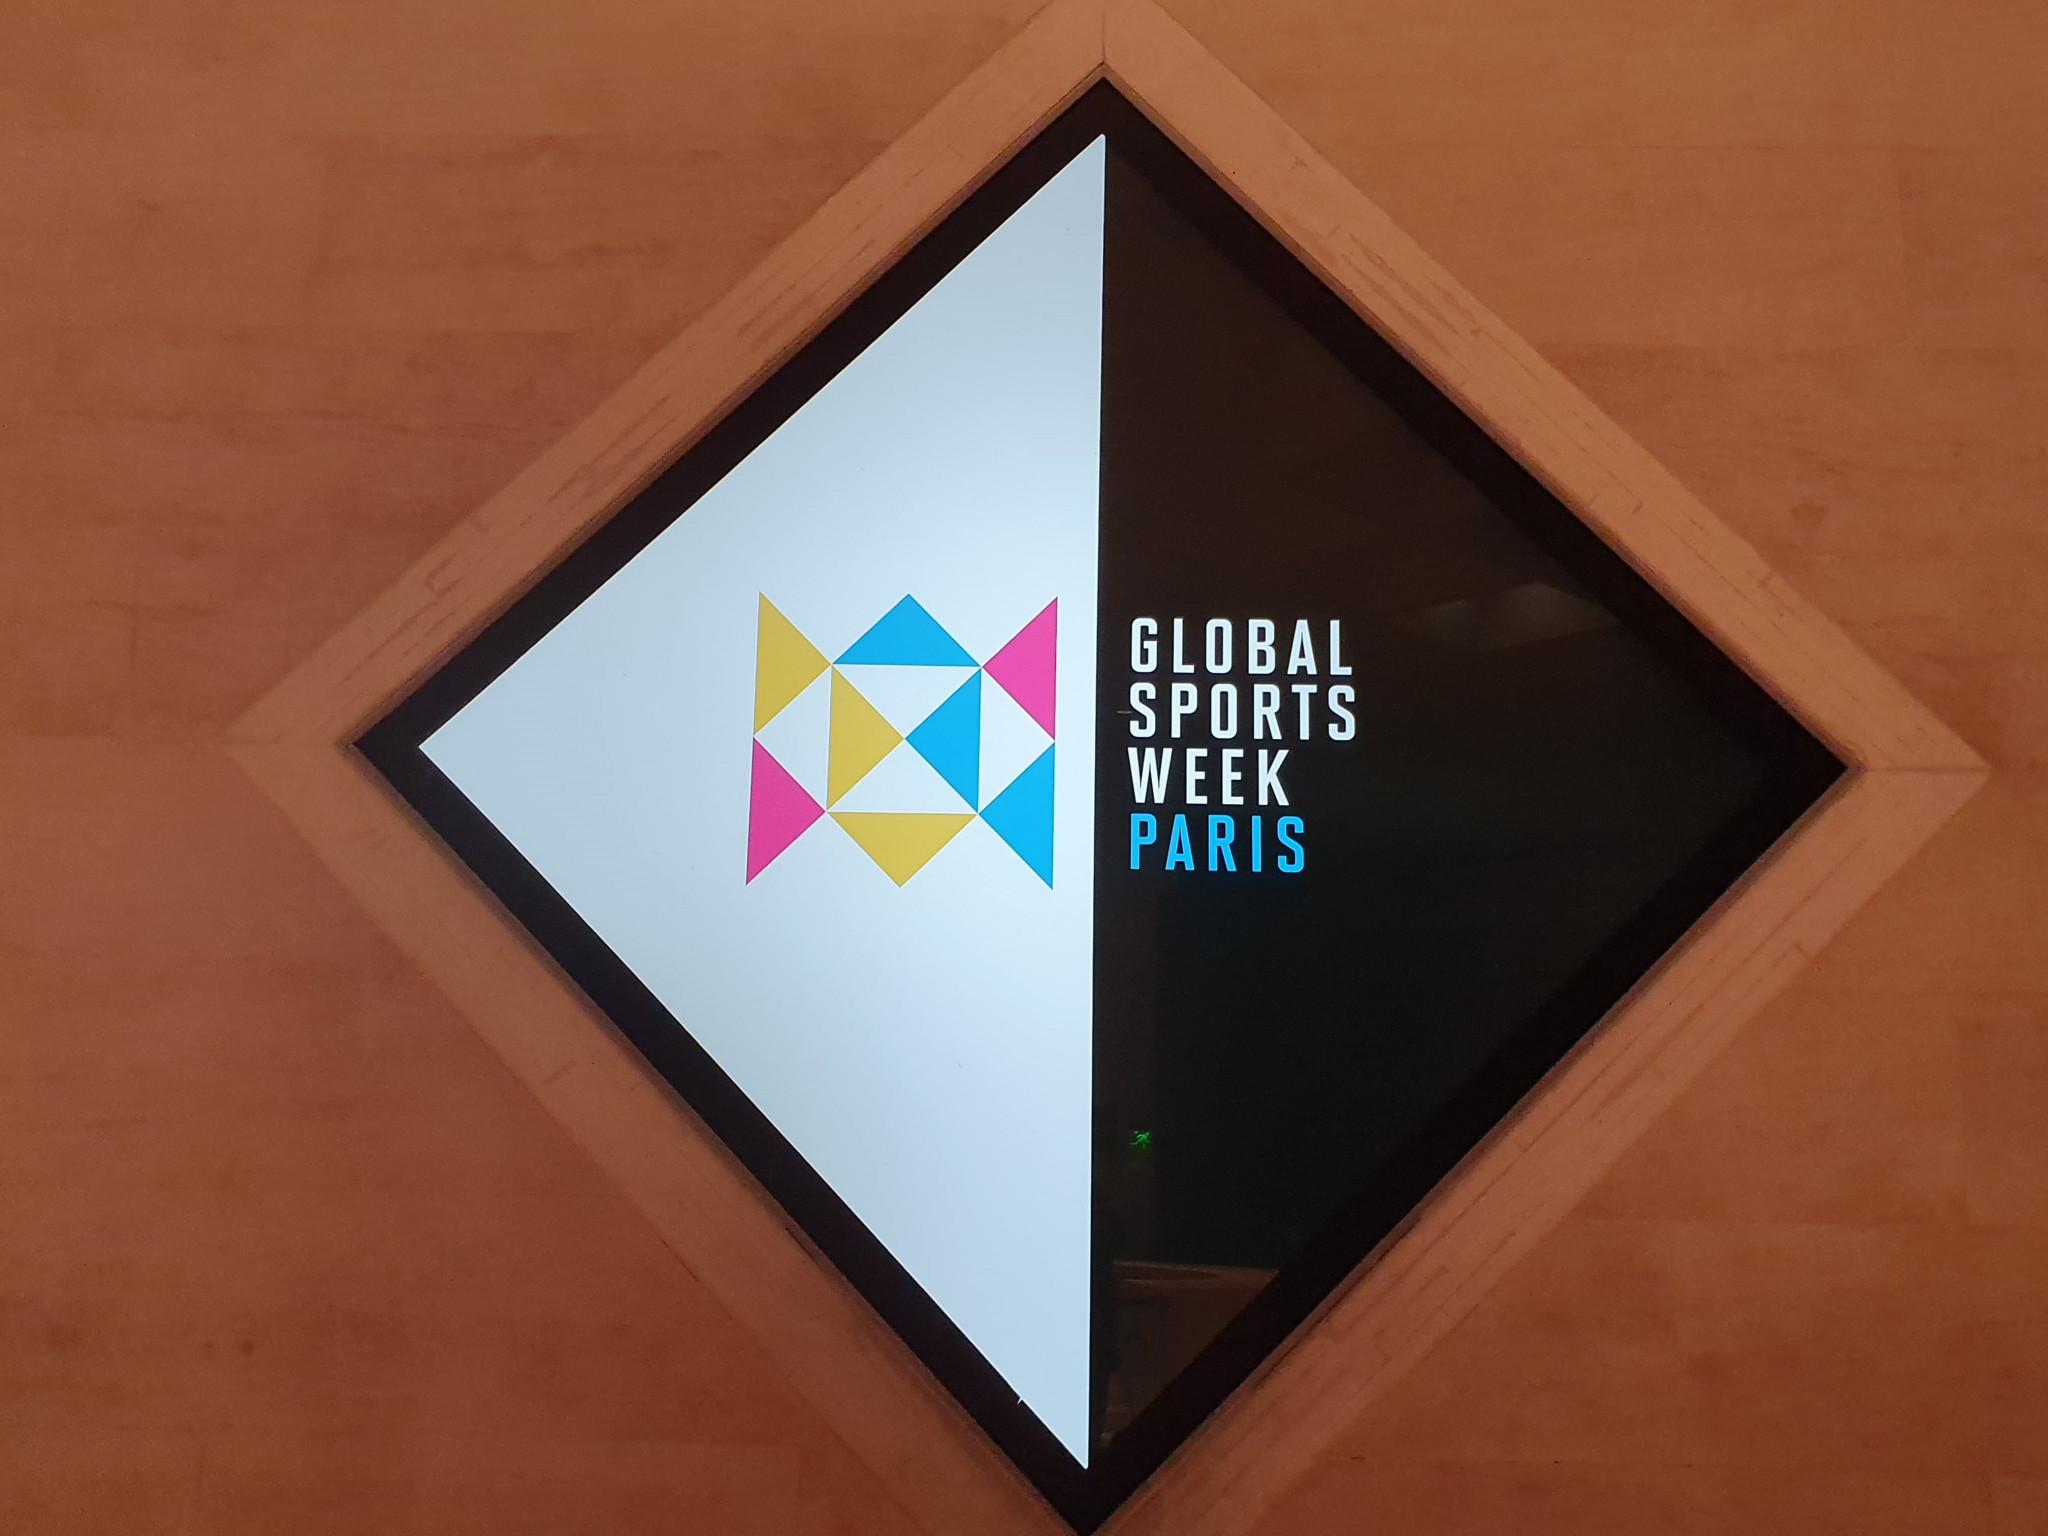 Climate change leads agenda at inaugural Global Sports Week Paris